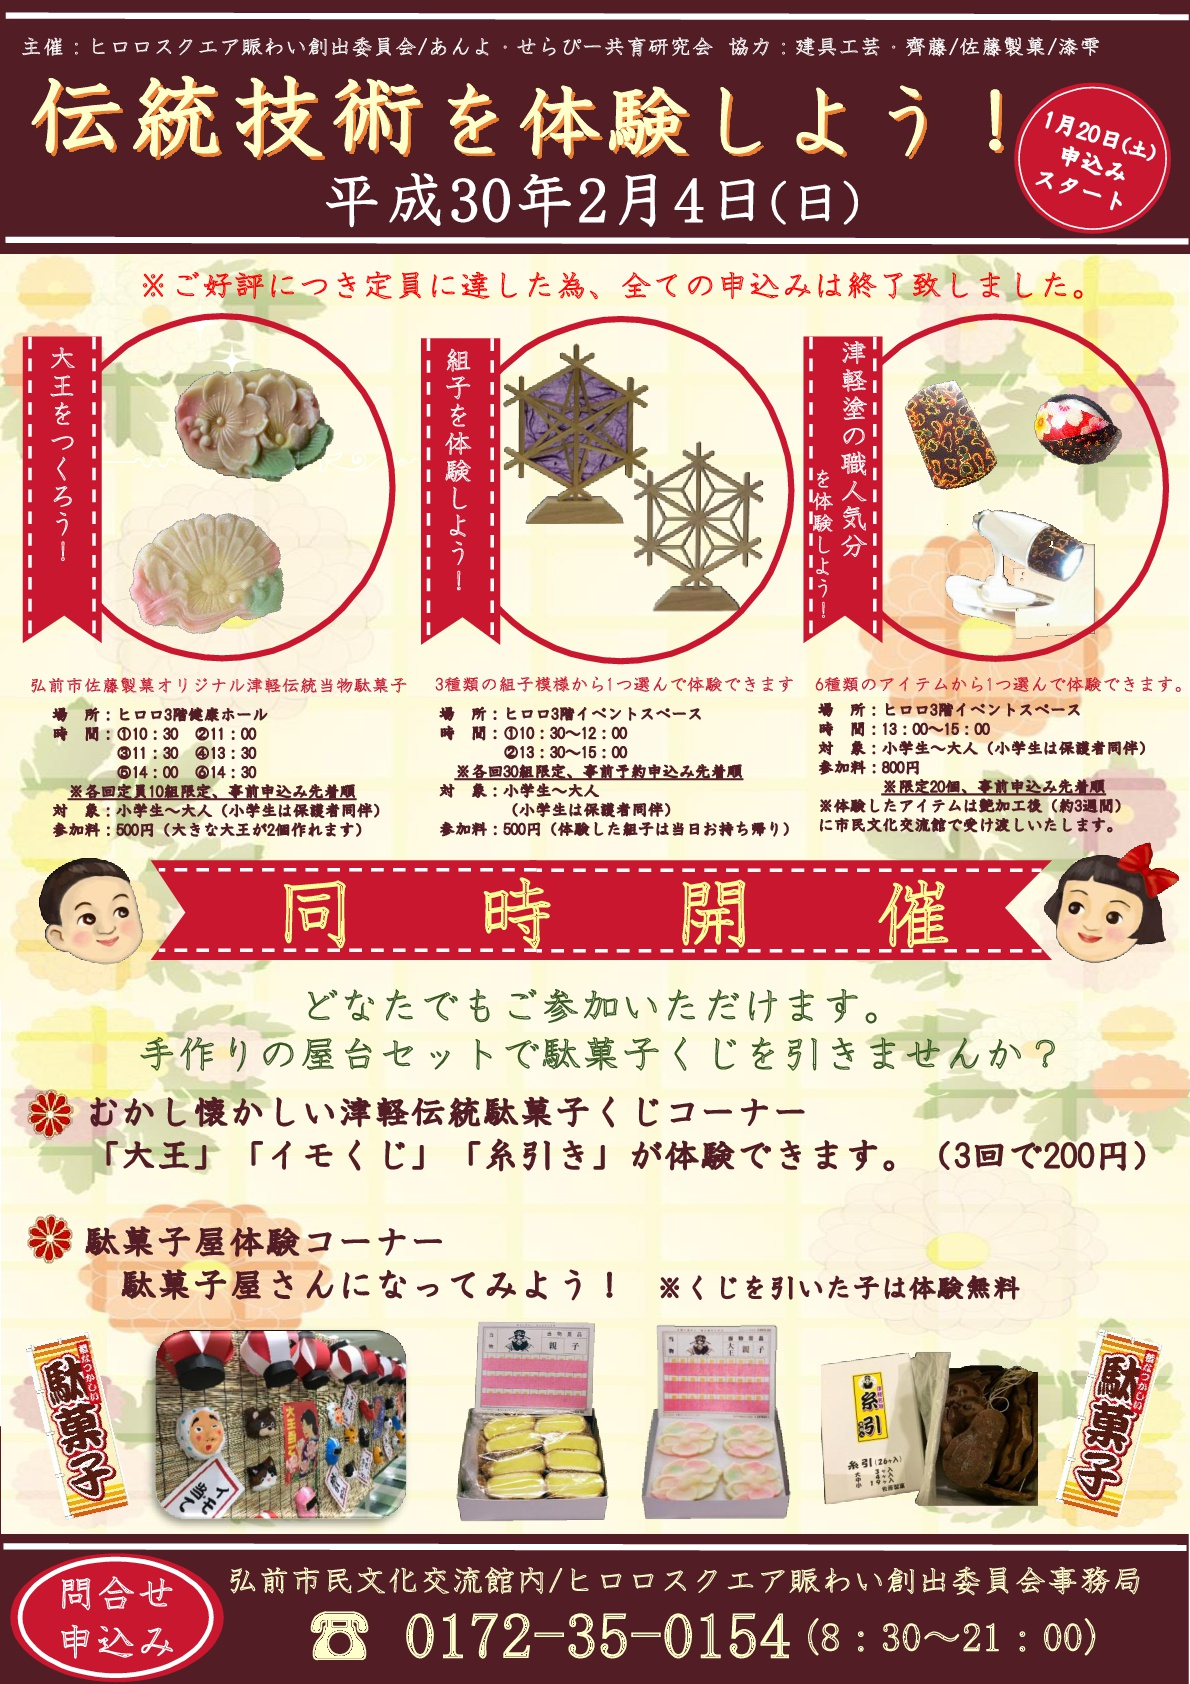 ●NEW津軽塗・組子・大王カラー最終チラシ.jpg